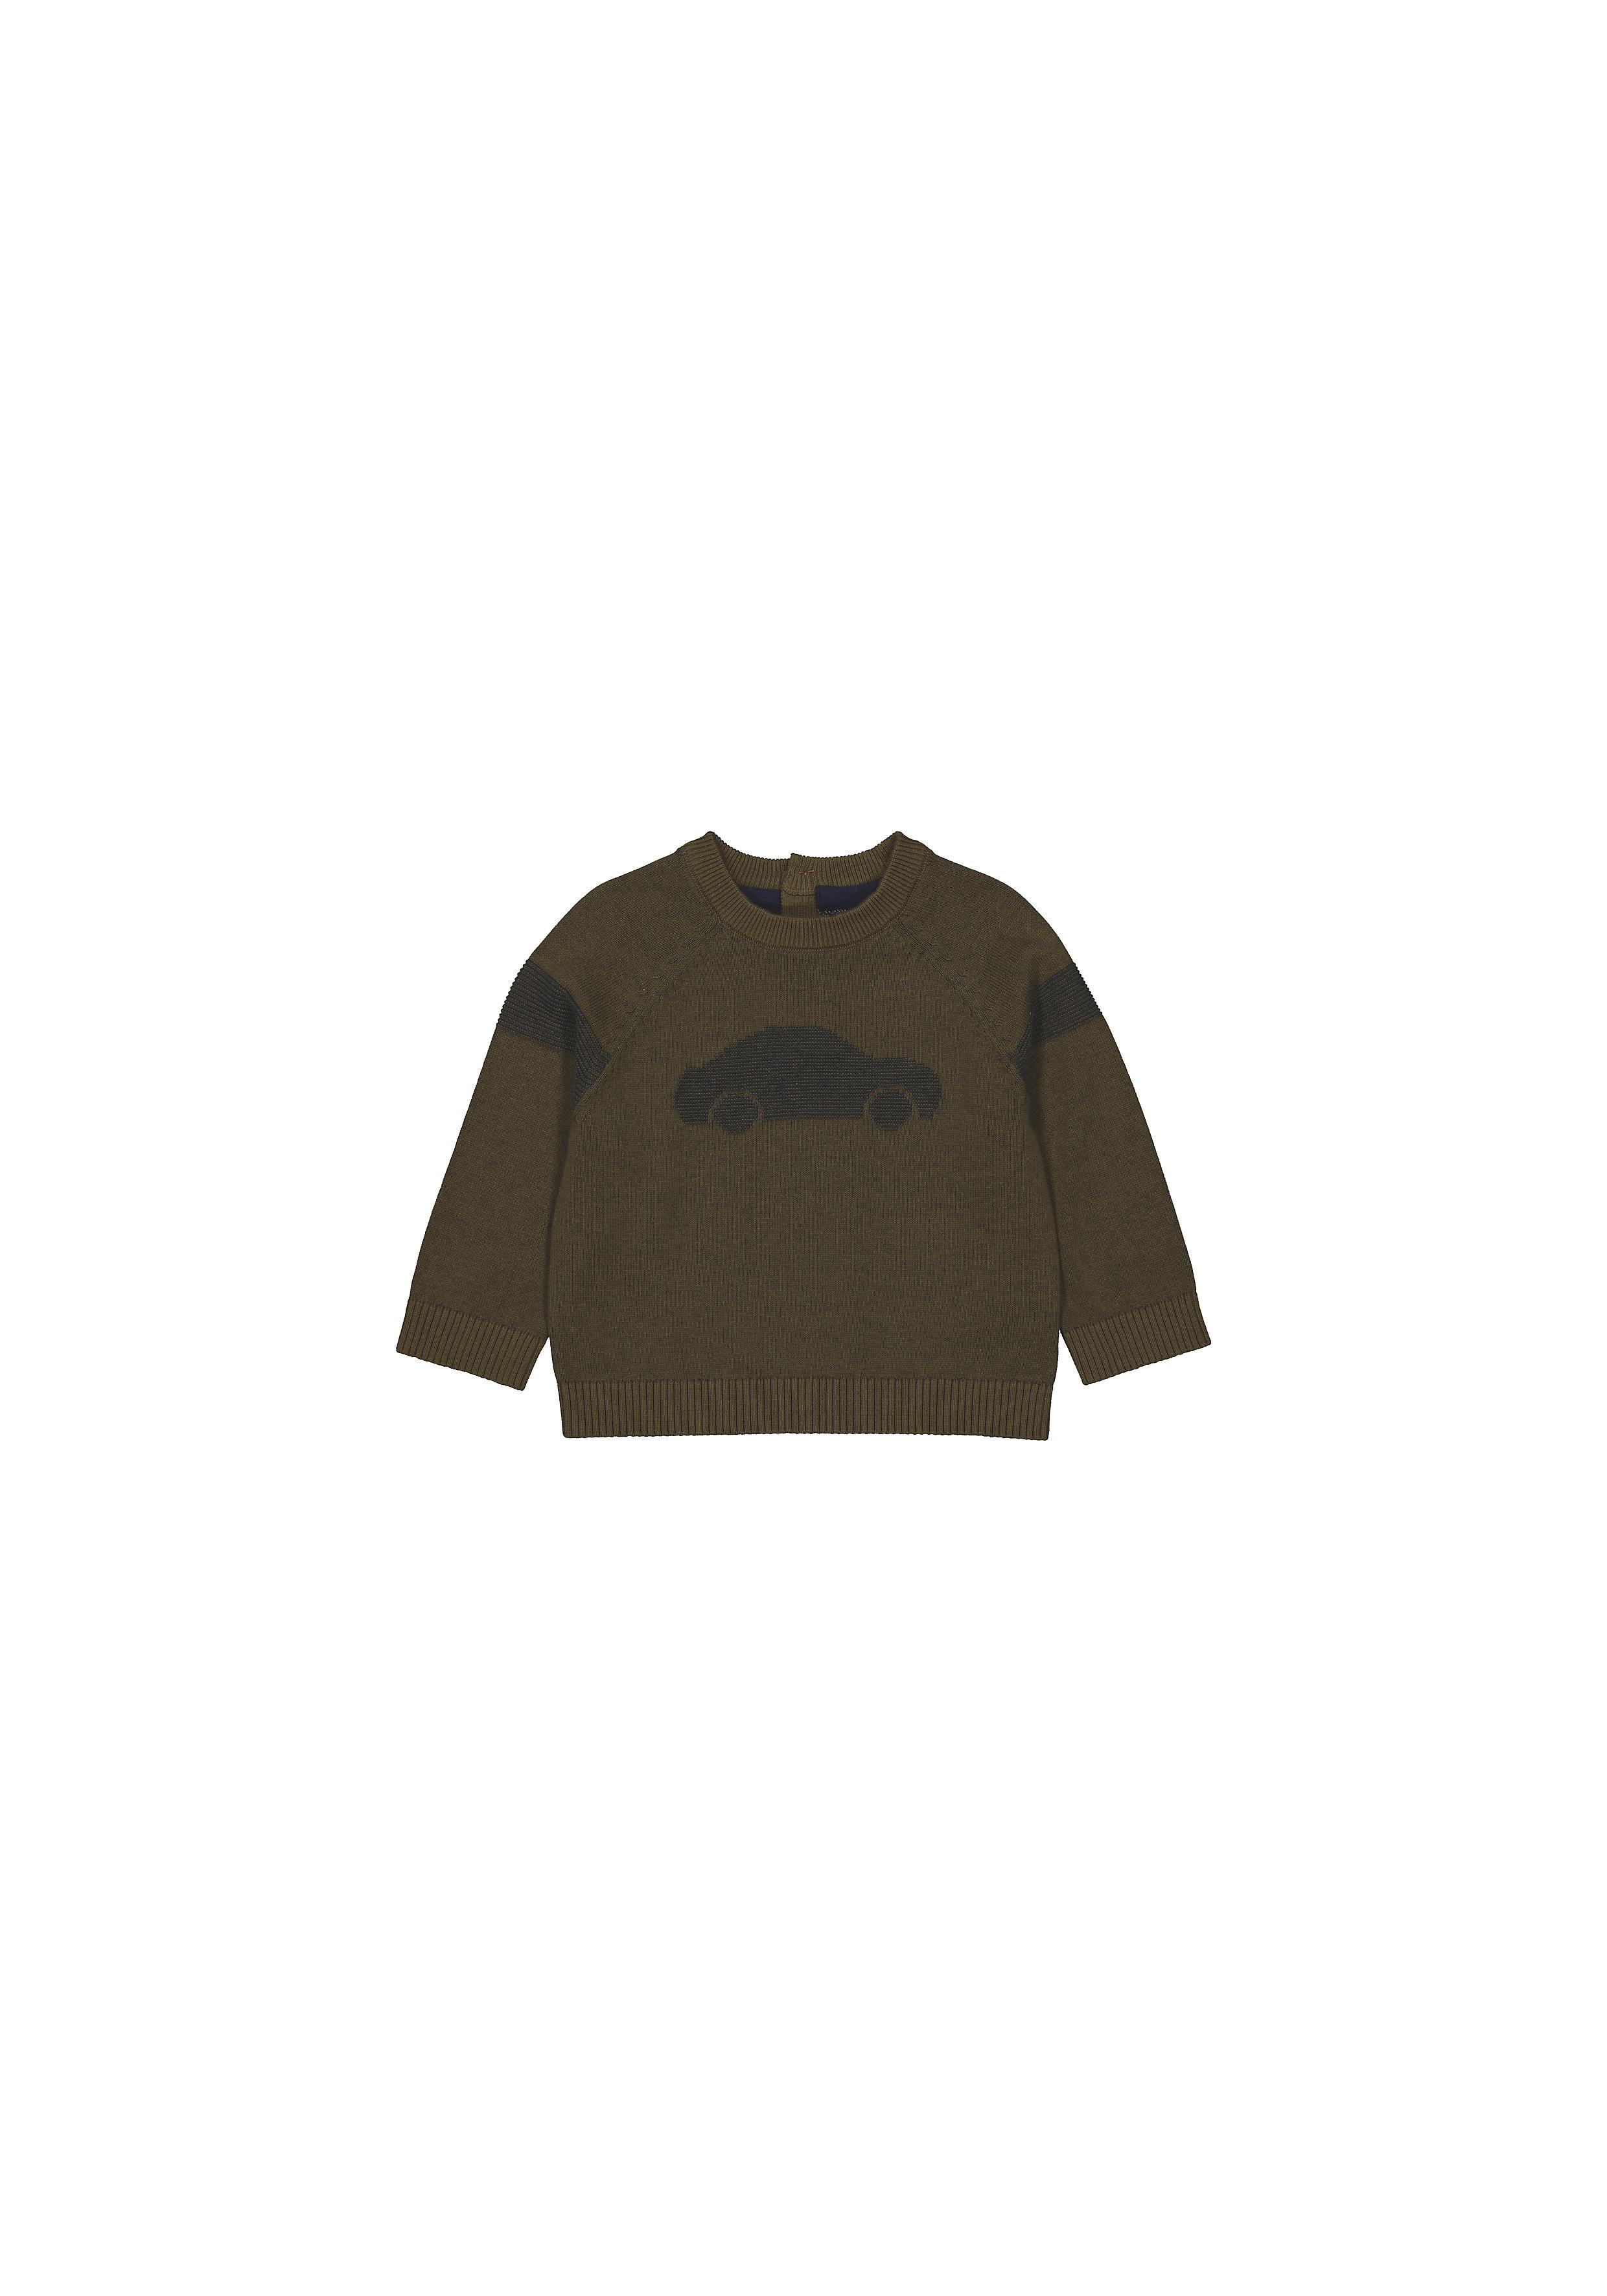 Mothercare   Boys Full Sleeves Sweaters  - Khaki